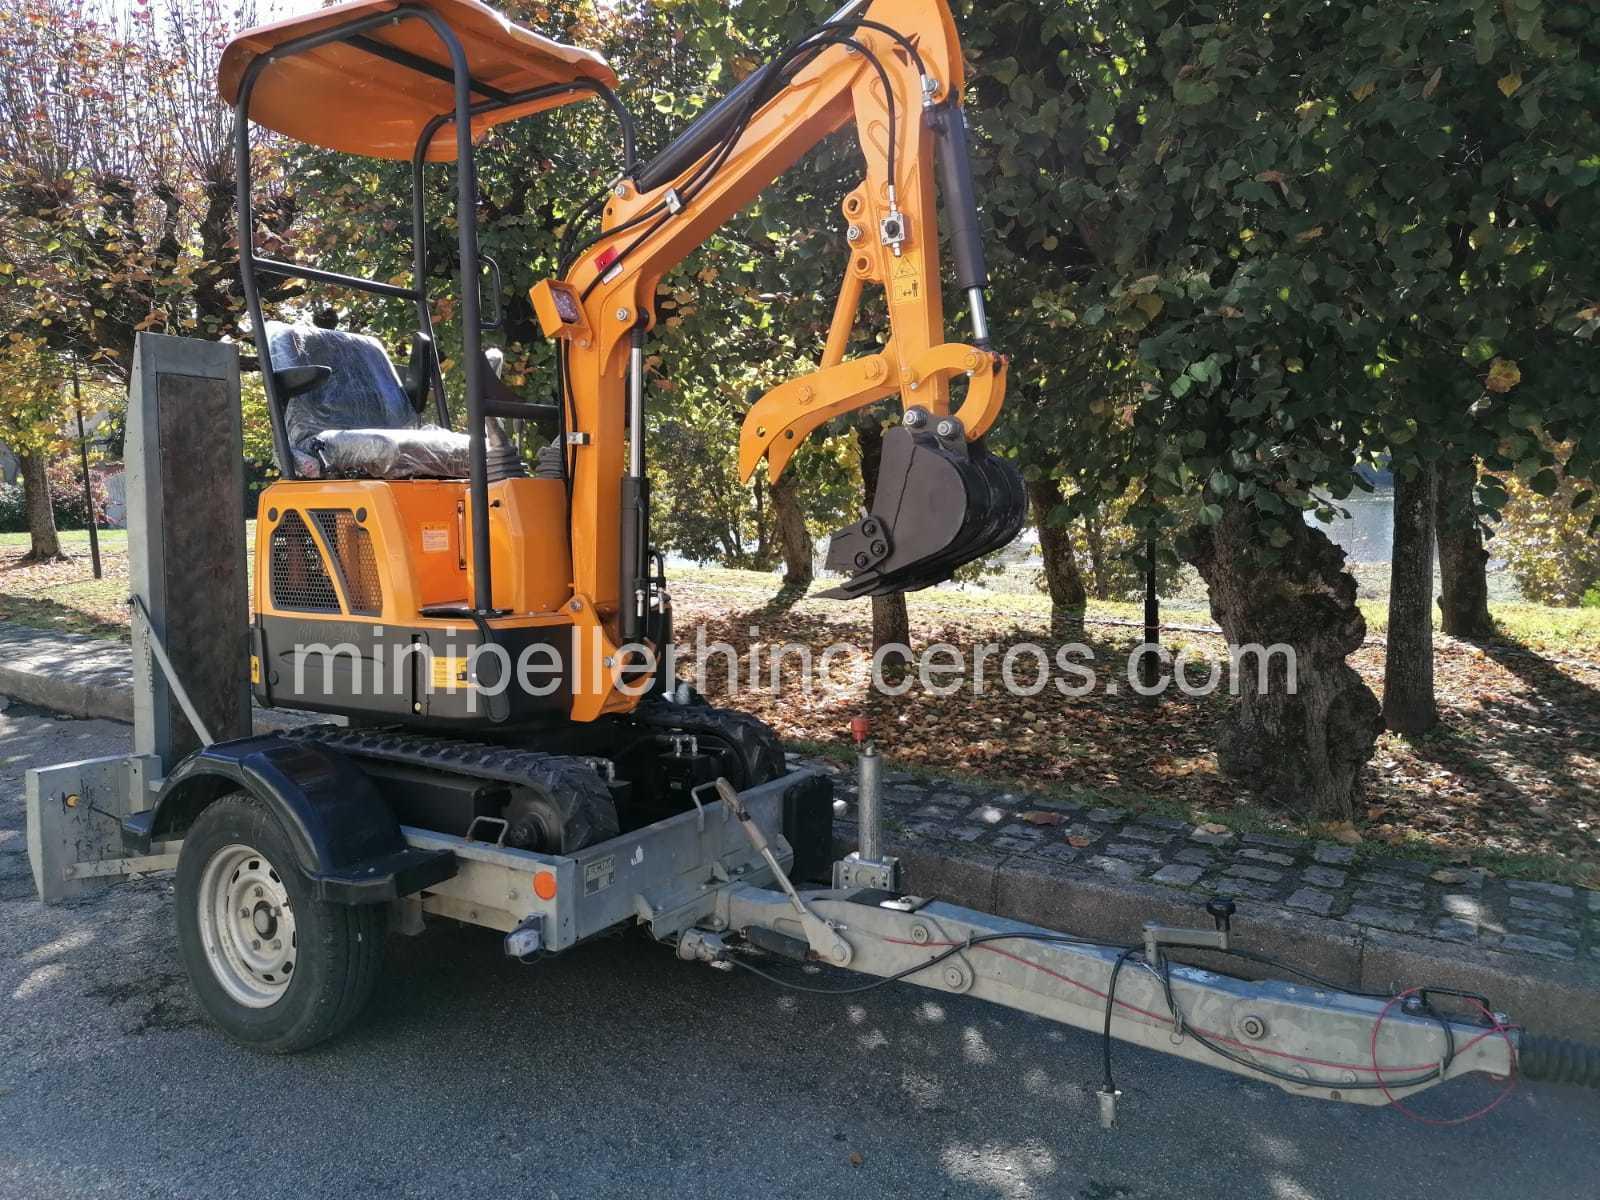 How do I load my Mini Excavator?